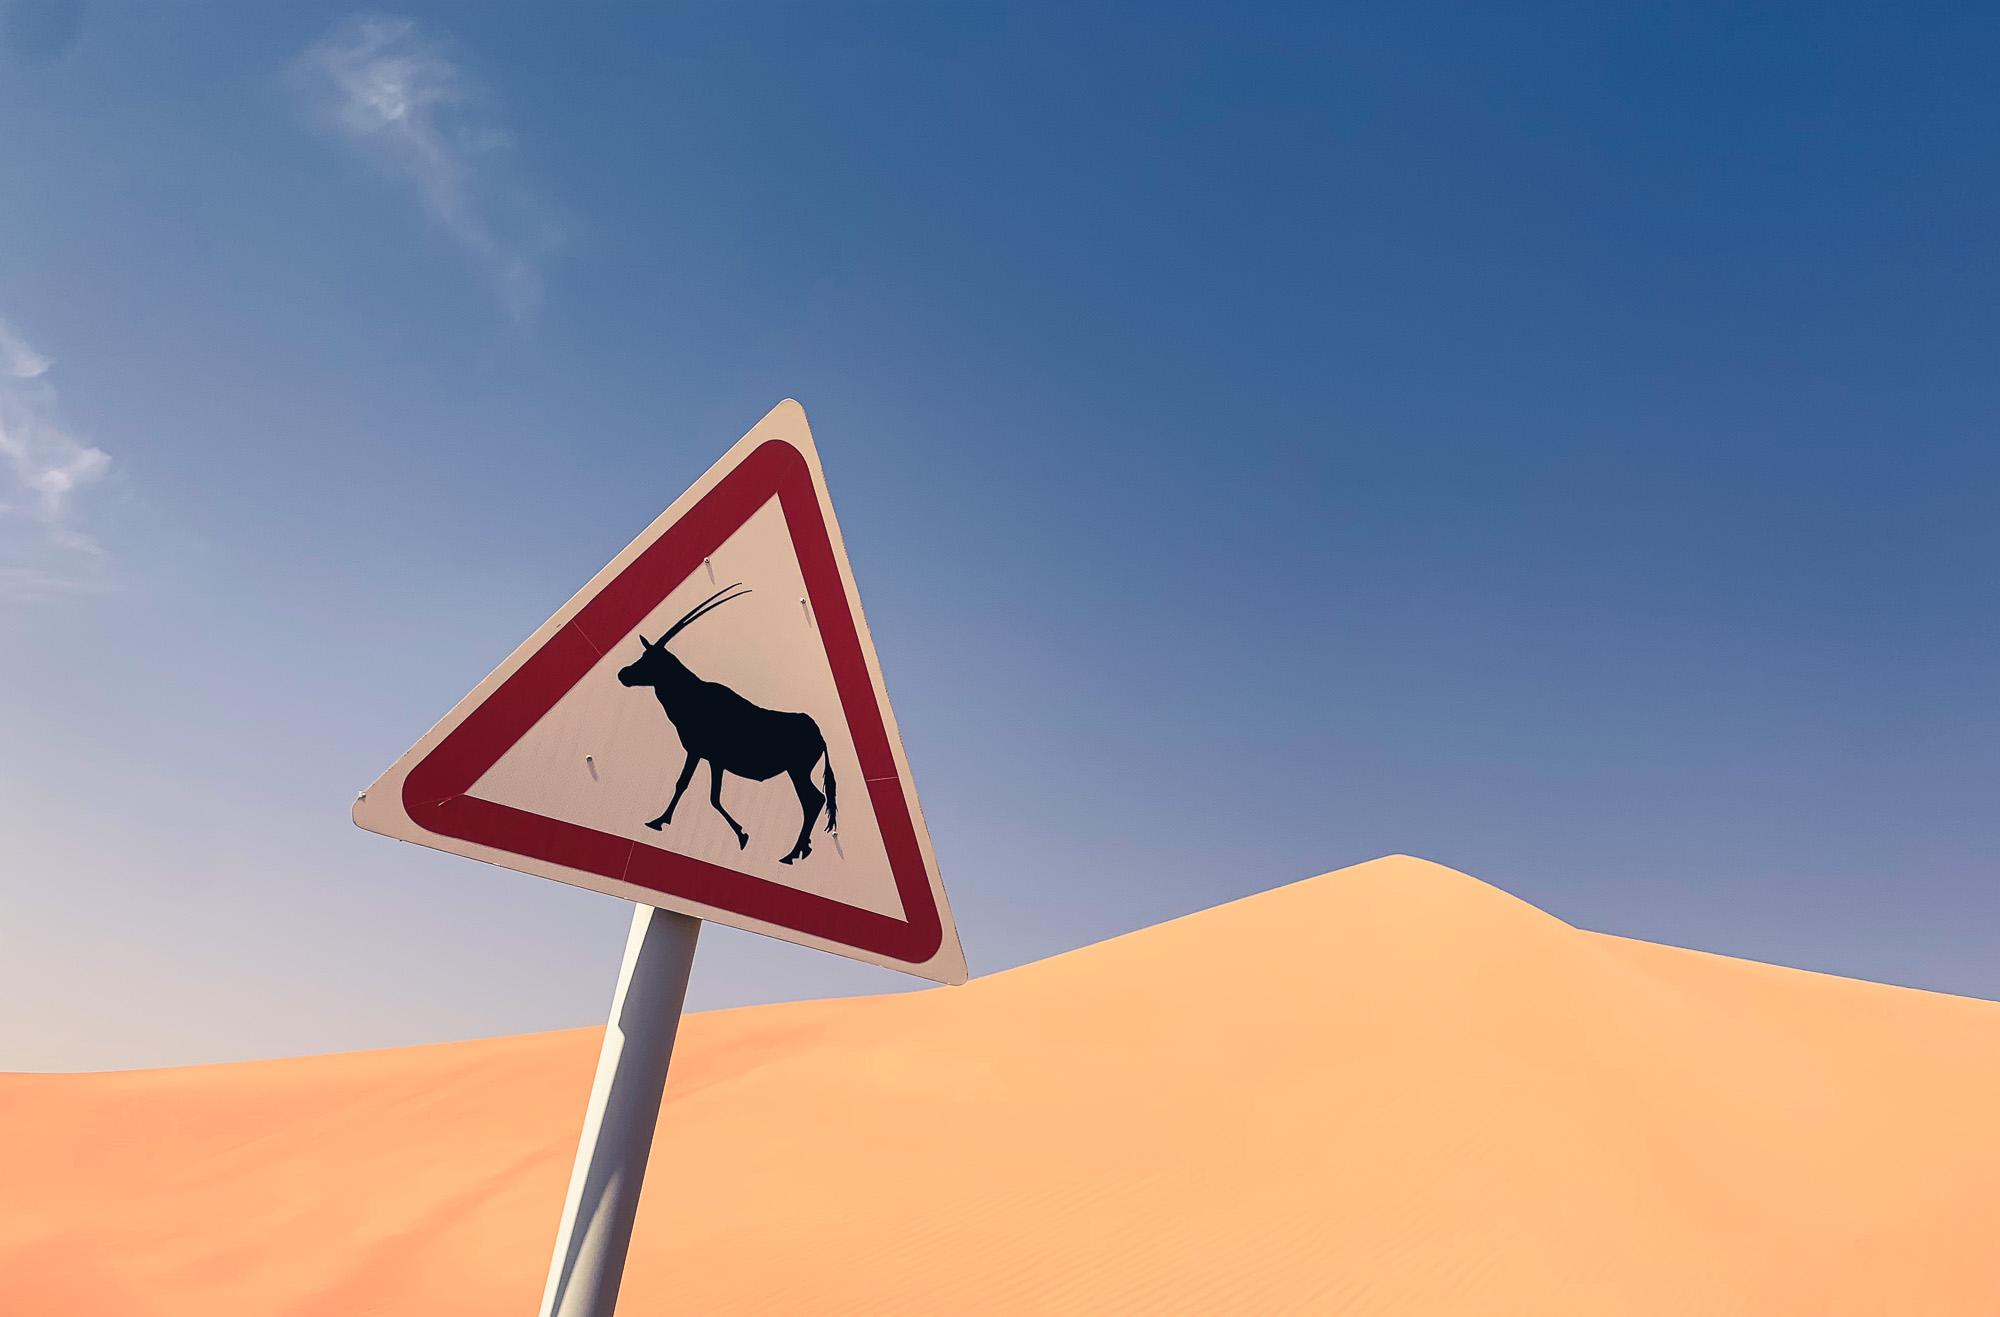 Oryx Warning